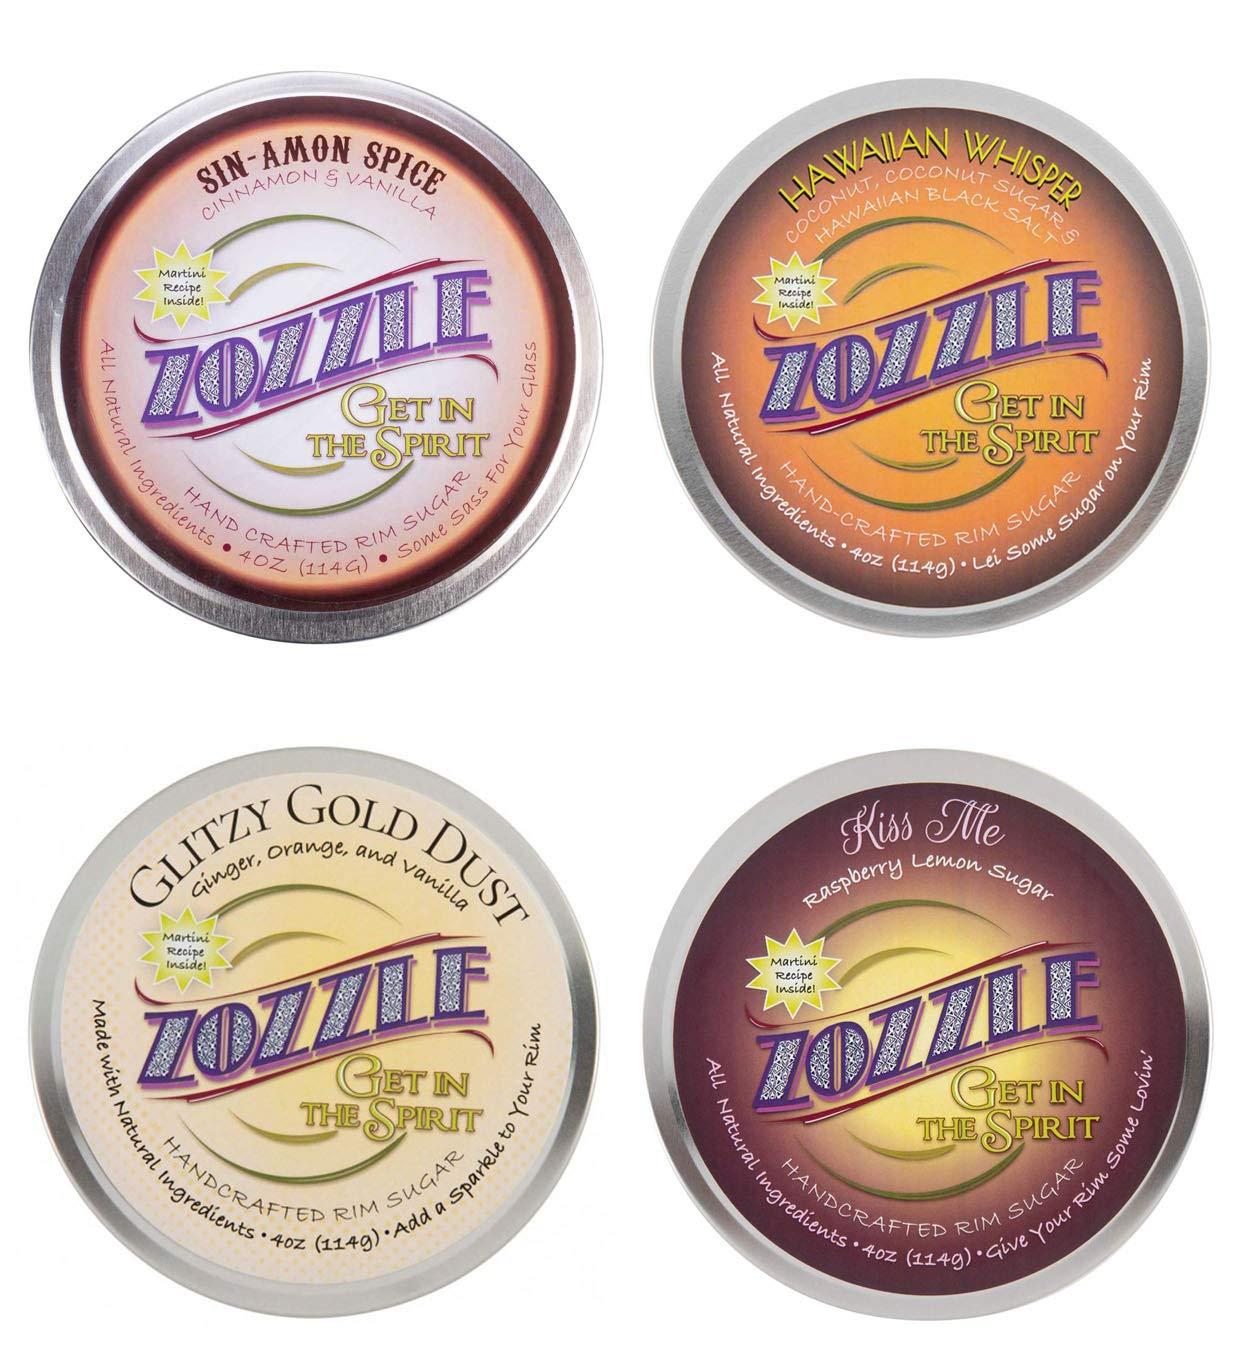 Zozzle Handcrafted Rimming Sugar 4 oz Variety 4-Pack - Ginger Orange, Coconut, Raspberry Lemon, Cinnamon